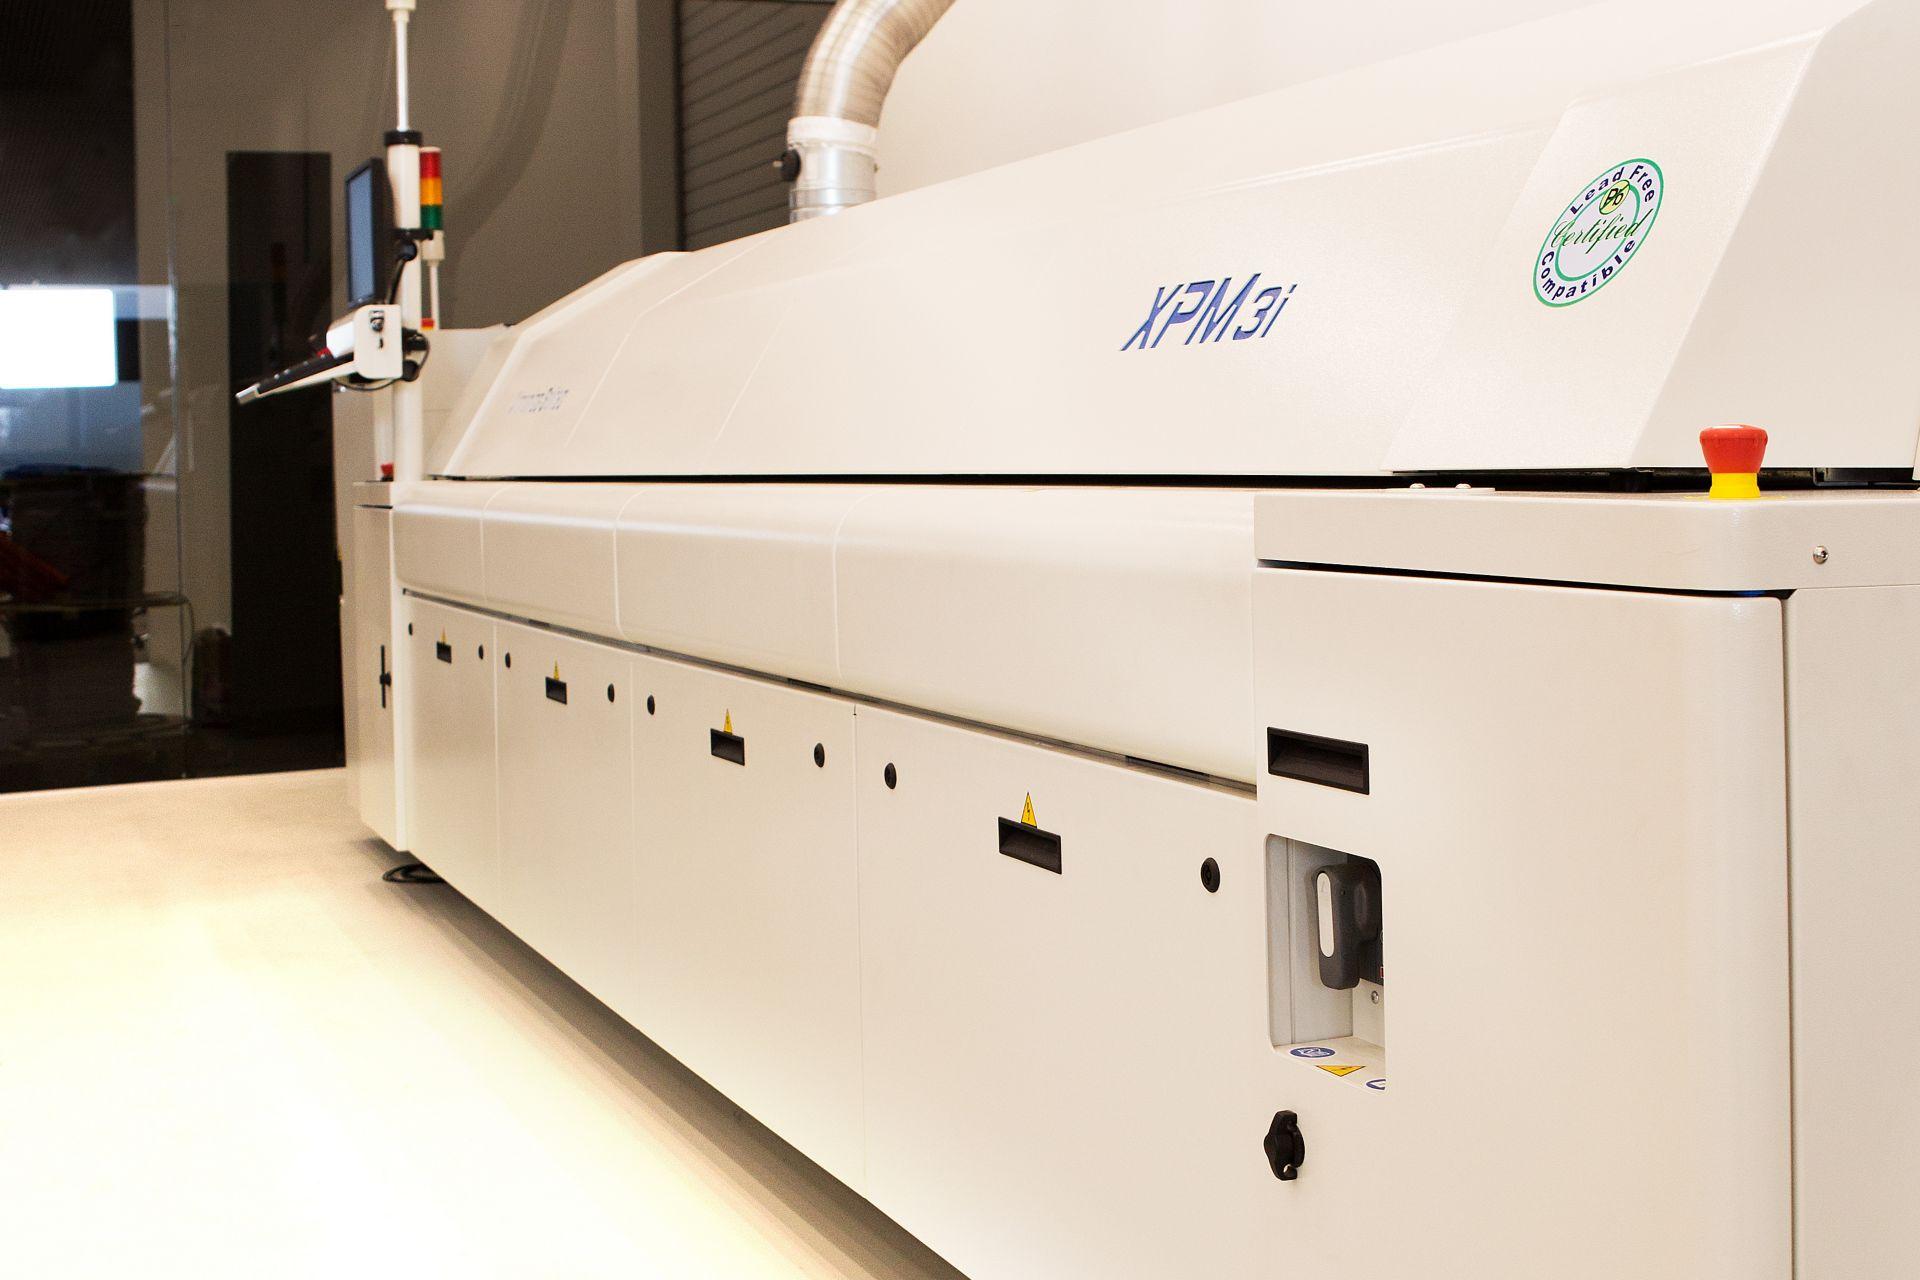 Elektrostatisch ableitfähige Beschichtung im Produktionsbereich